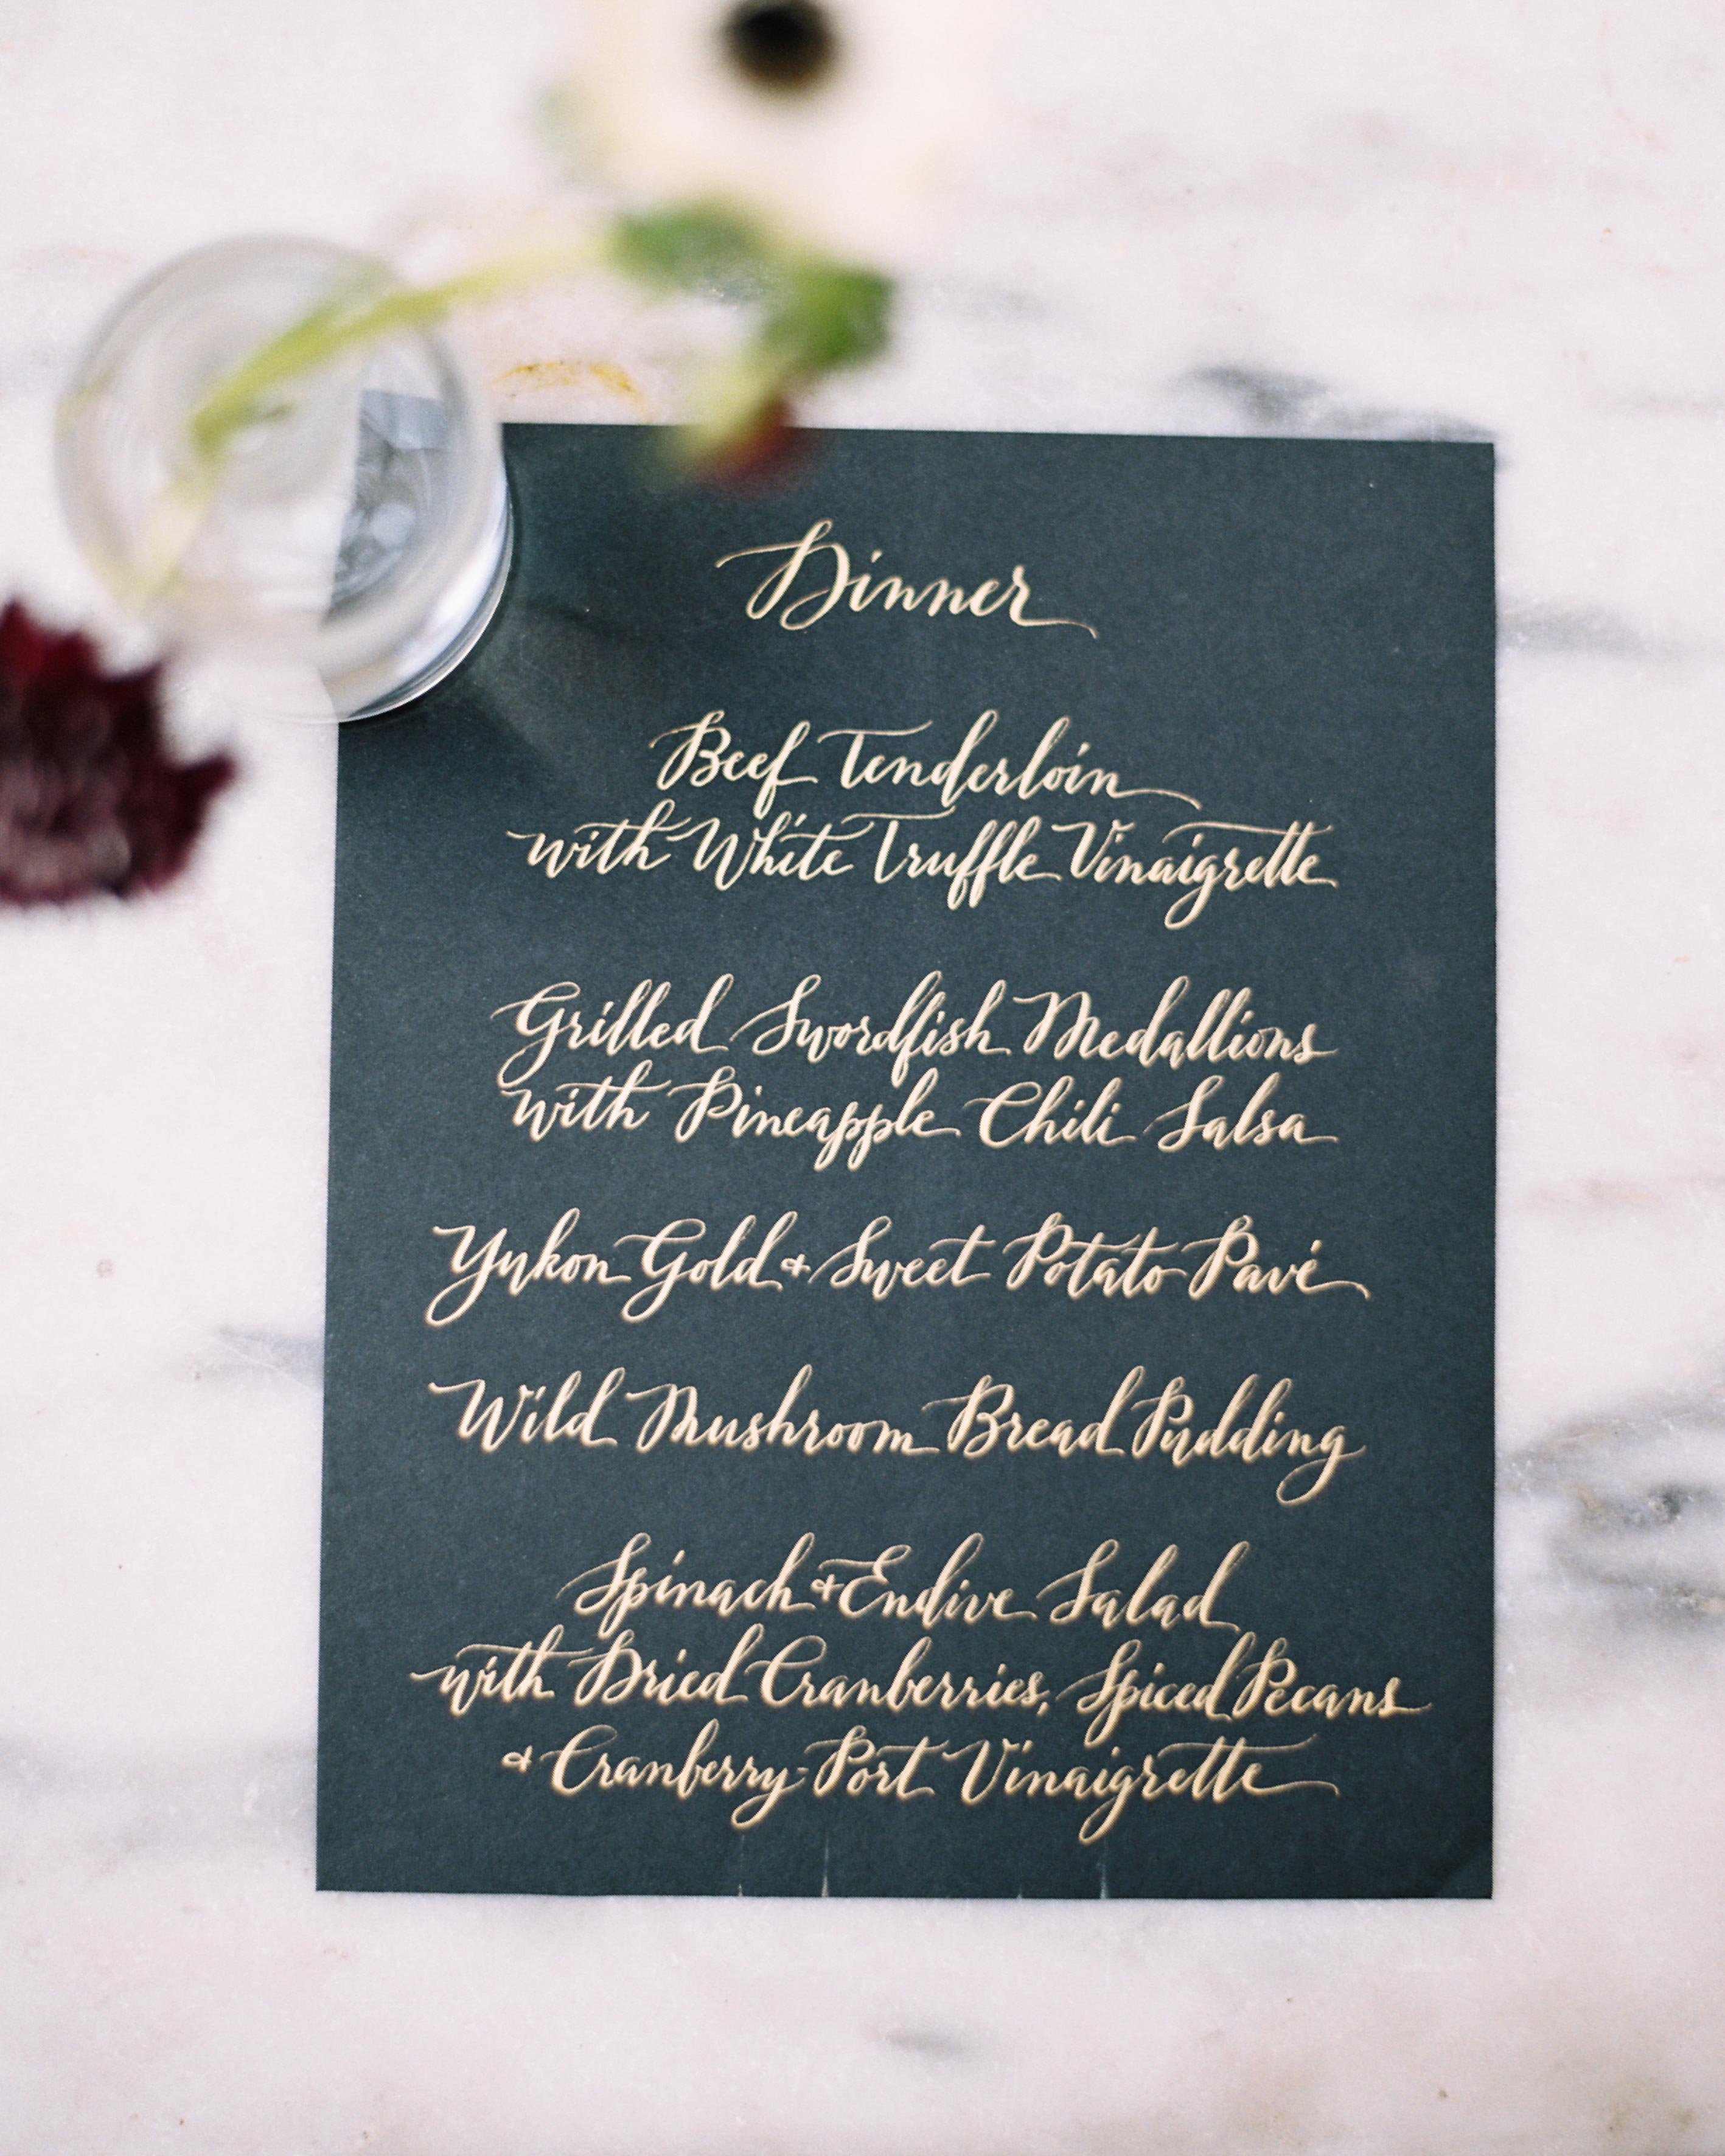 katie-kent-wedding-menu-023-s112765-0316.jpg